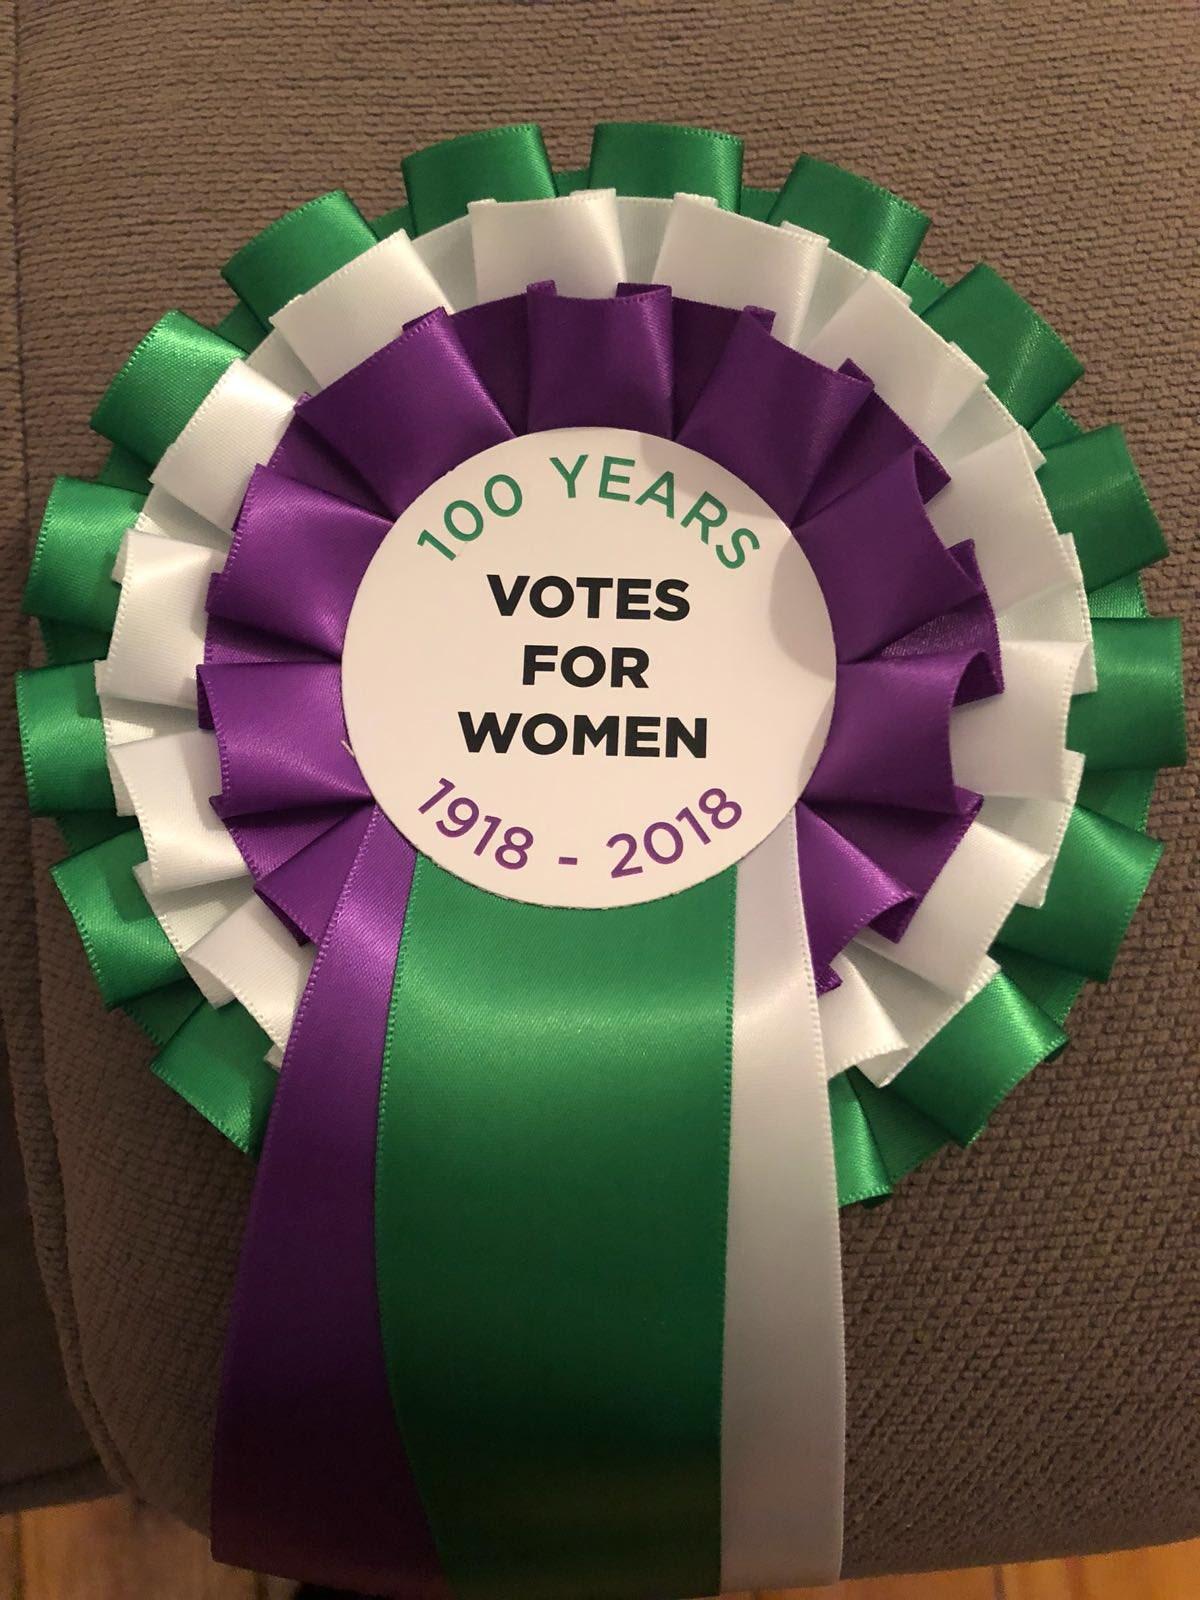 #Vote100 #suffrage https://t.co/GuyUUYn300